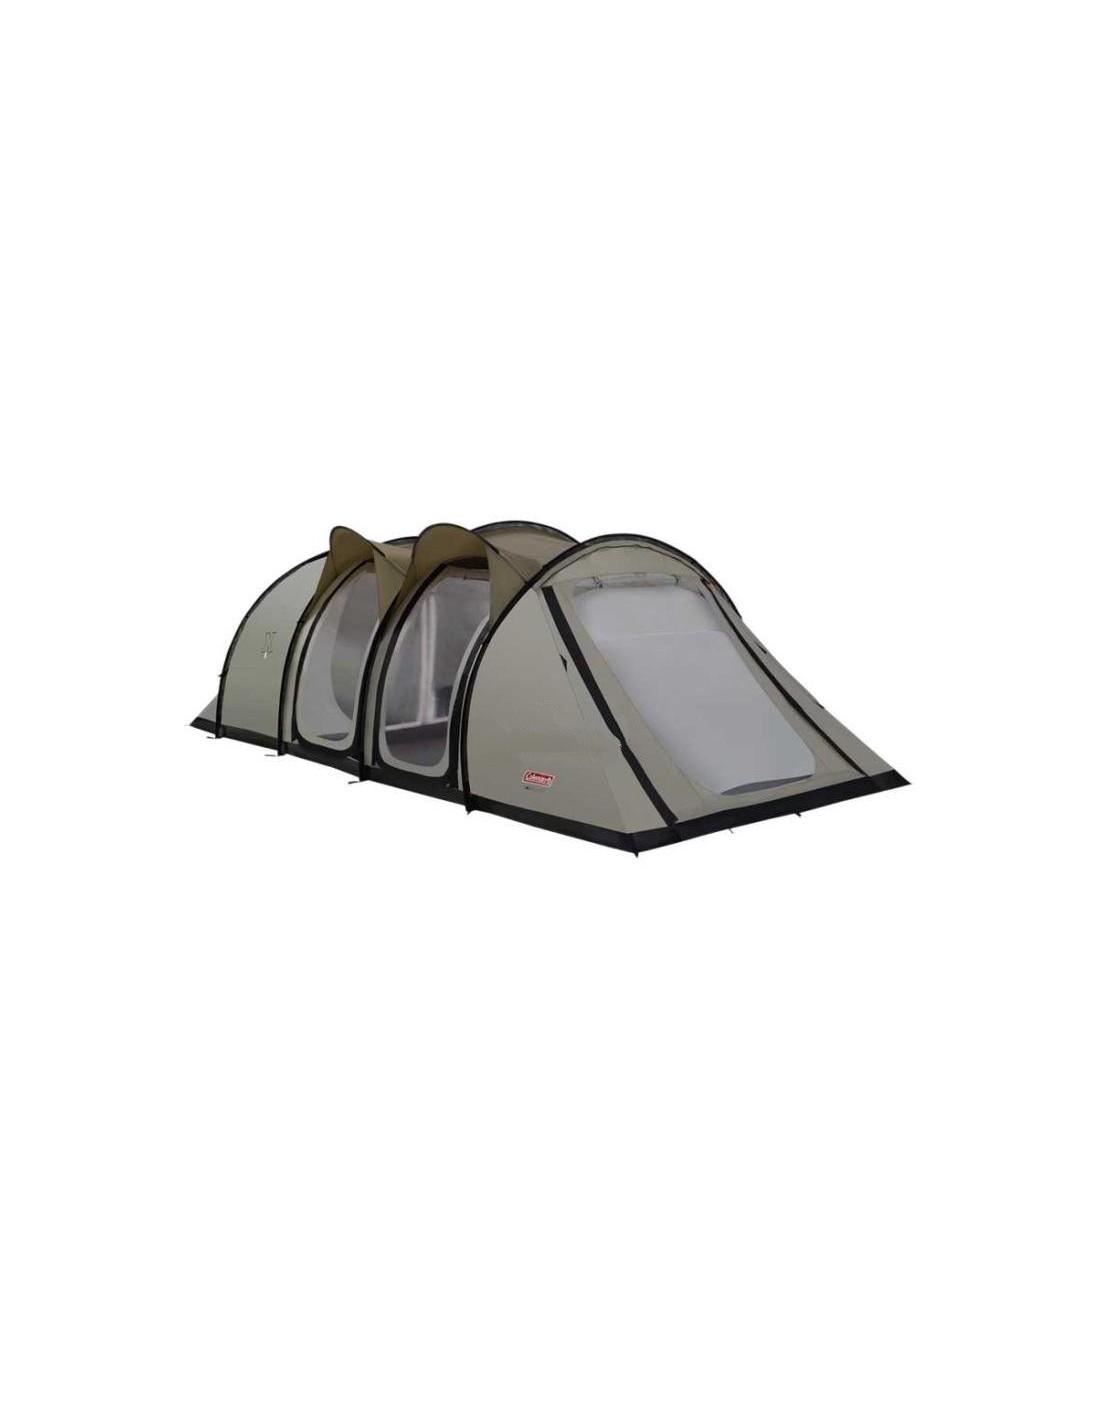 Tunnelzelt Mackenzie F R 4 Personen Jundi Camping